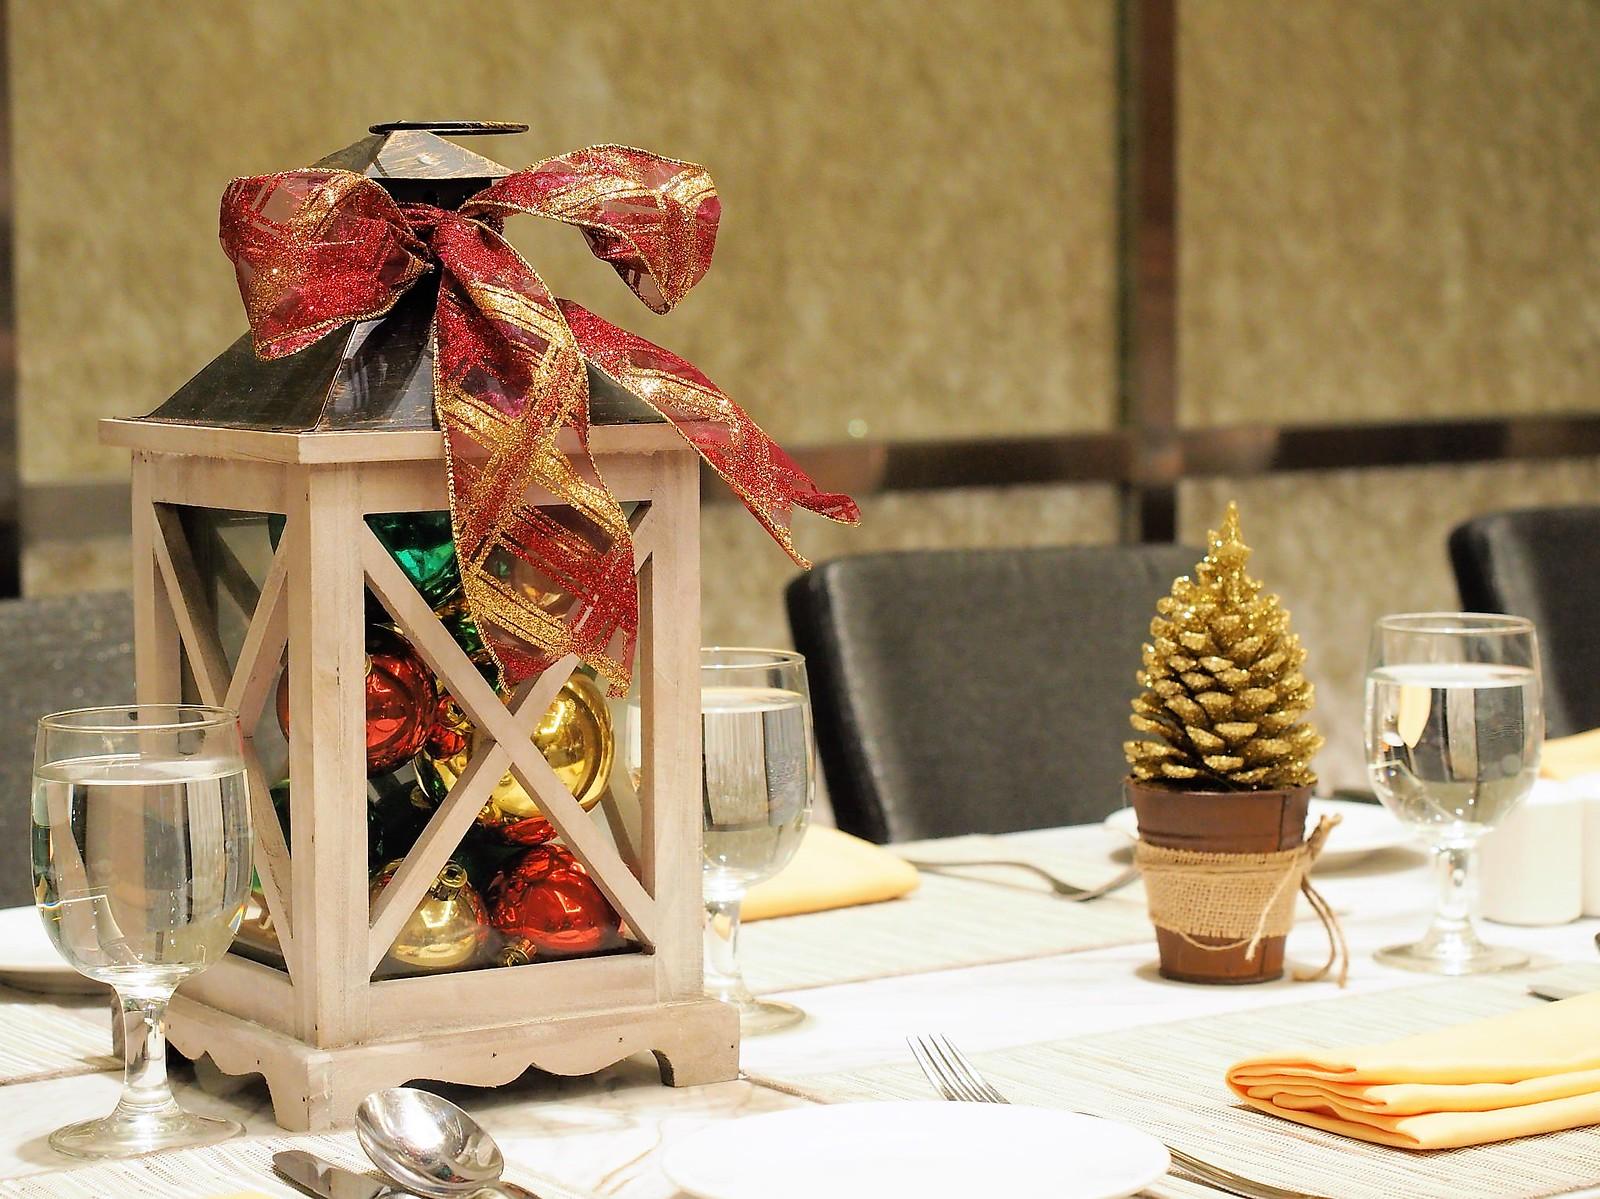 Christmas Decoration on dining table at Feast @ Sheraton Petaling Jaya